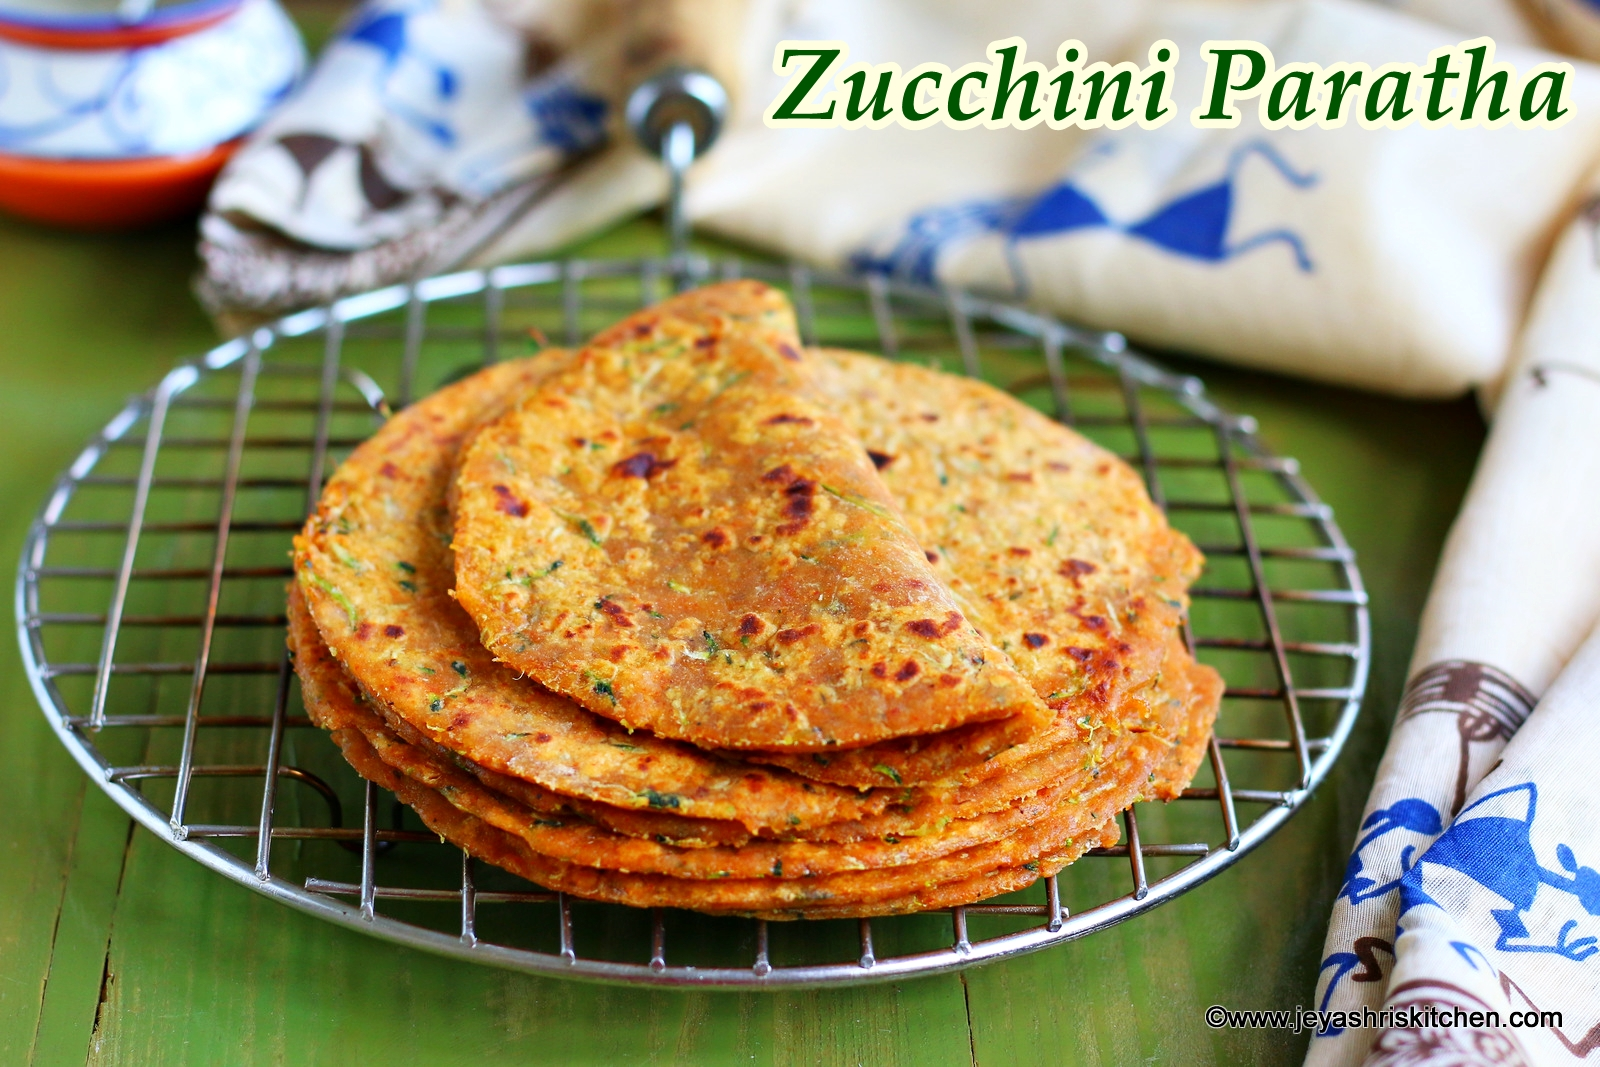 zucchini paratha recipe paratha recipes - Jeyashris Kitchen